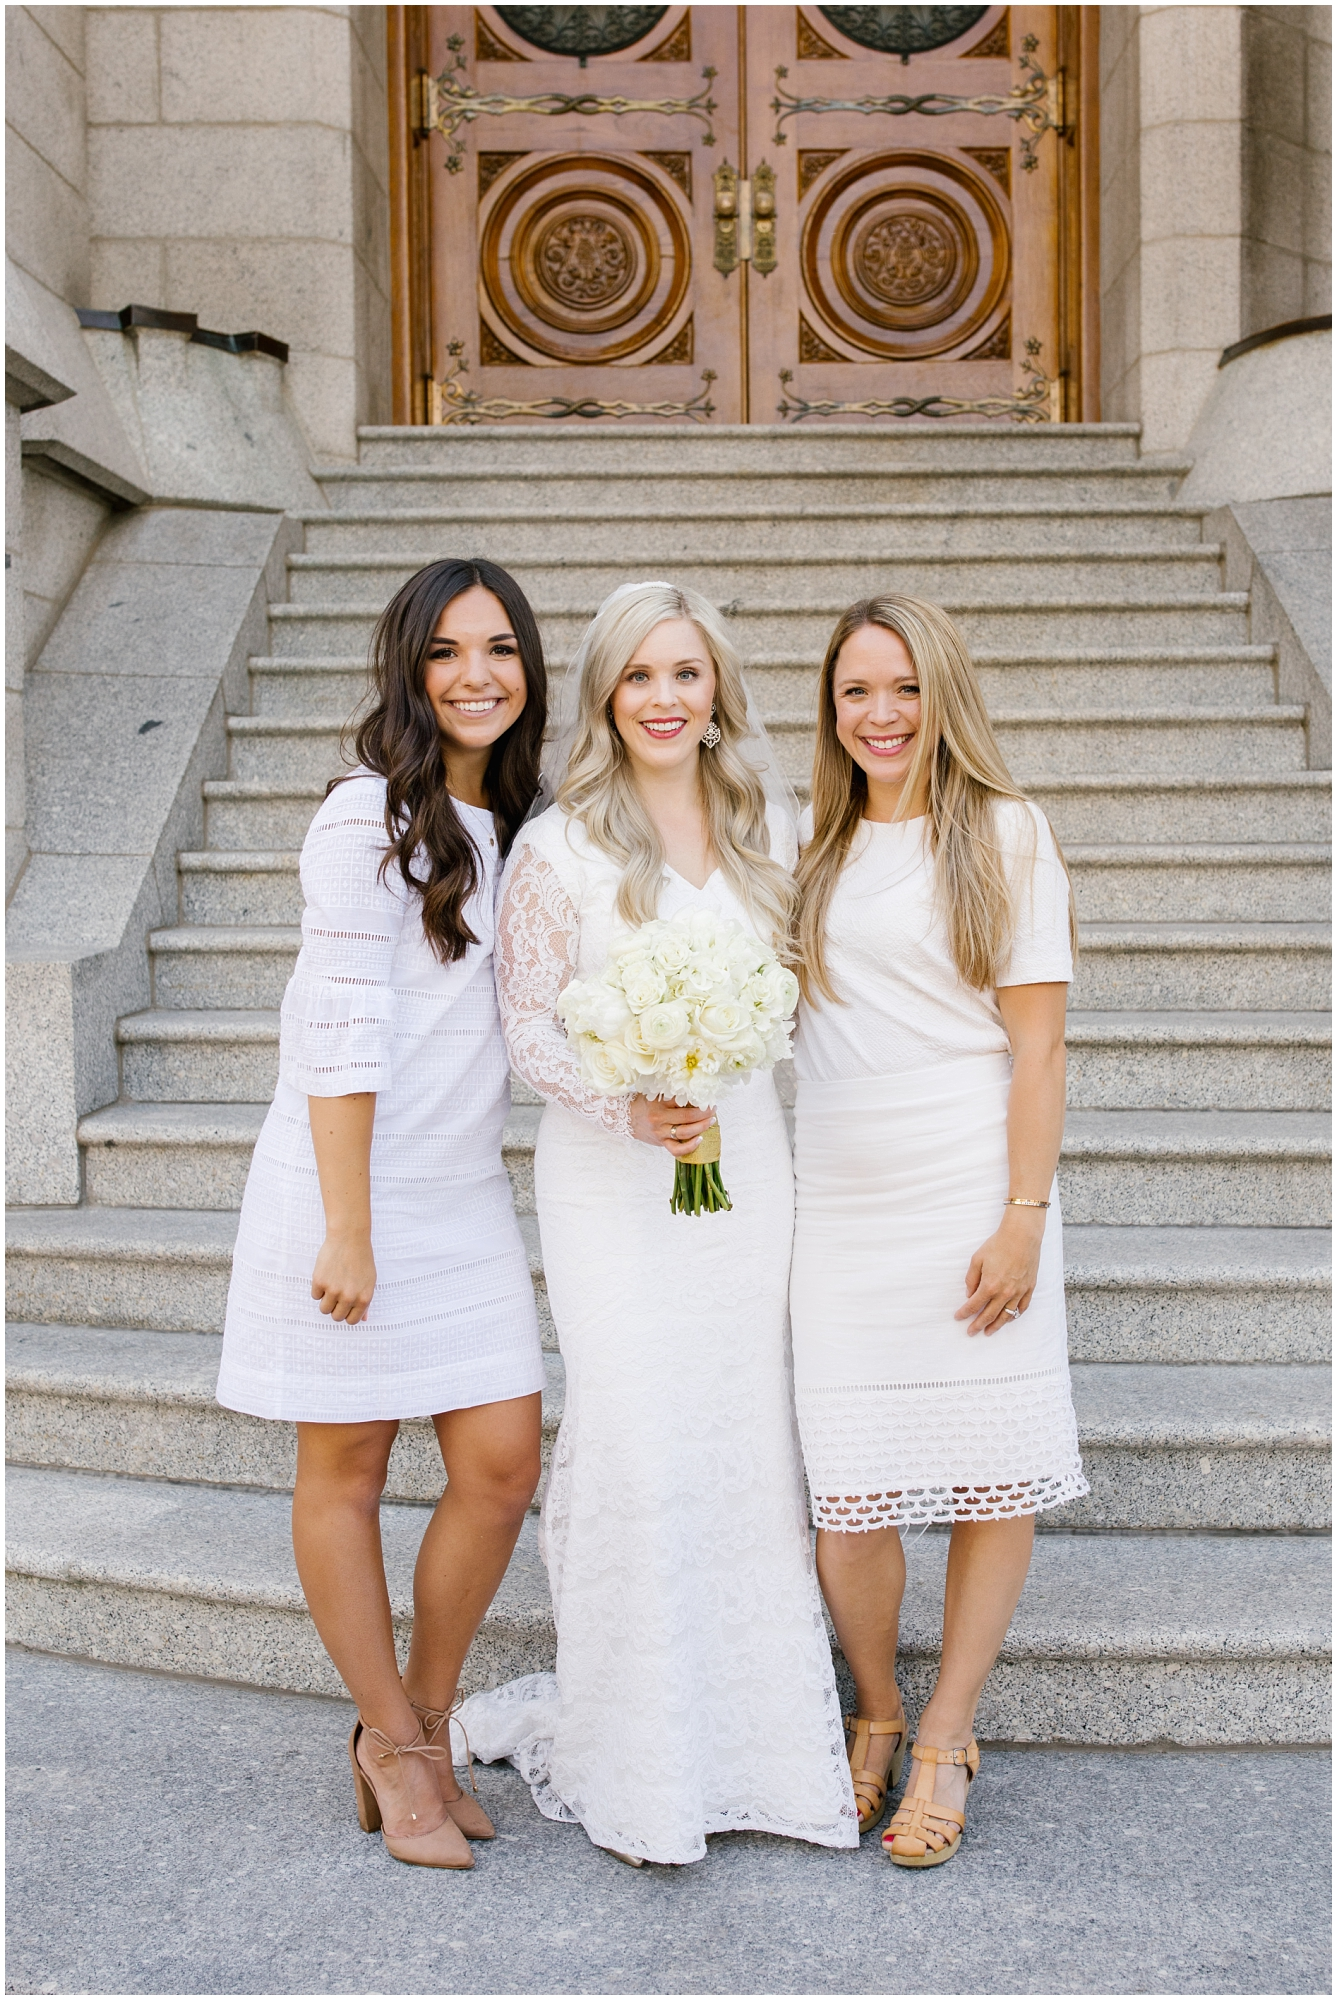 CherylandTyler-88_Lizzie-B-Imagery-Utah-Wedding-Photographer-Park-City-Salt-Lake-City-Temple-Wells-Fargo-Building.jpg